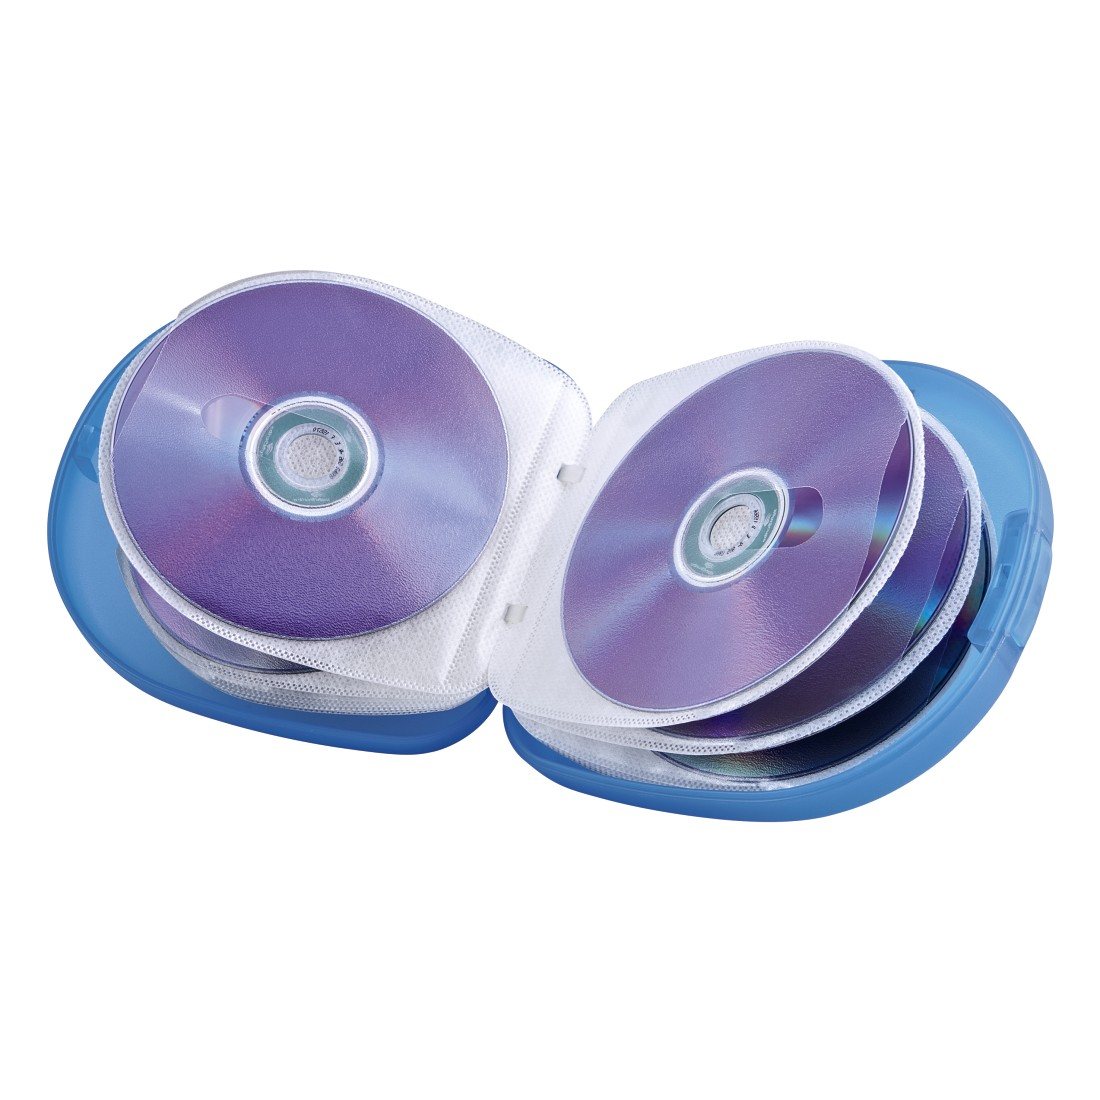 00051334 Hama CD-/DVD-/Blu-ray-Case 24, Transparent/Blau | Hama DE